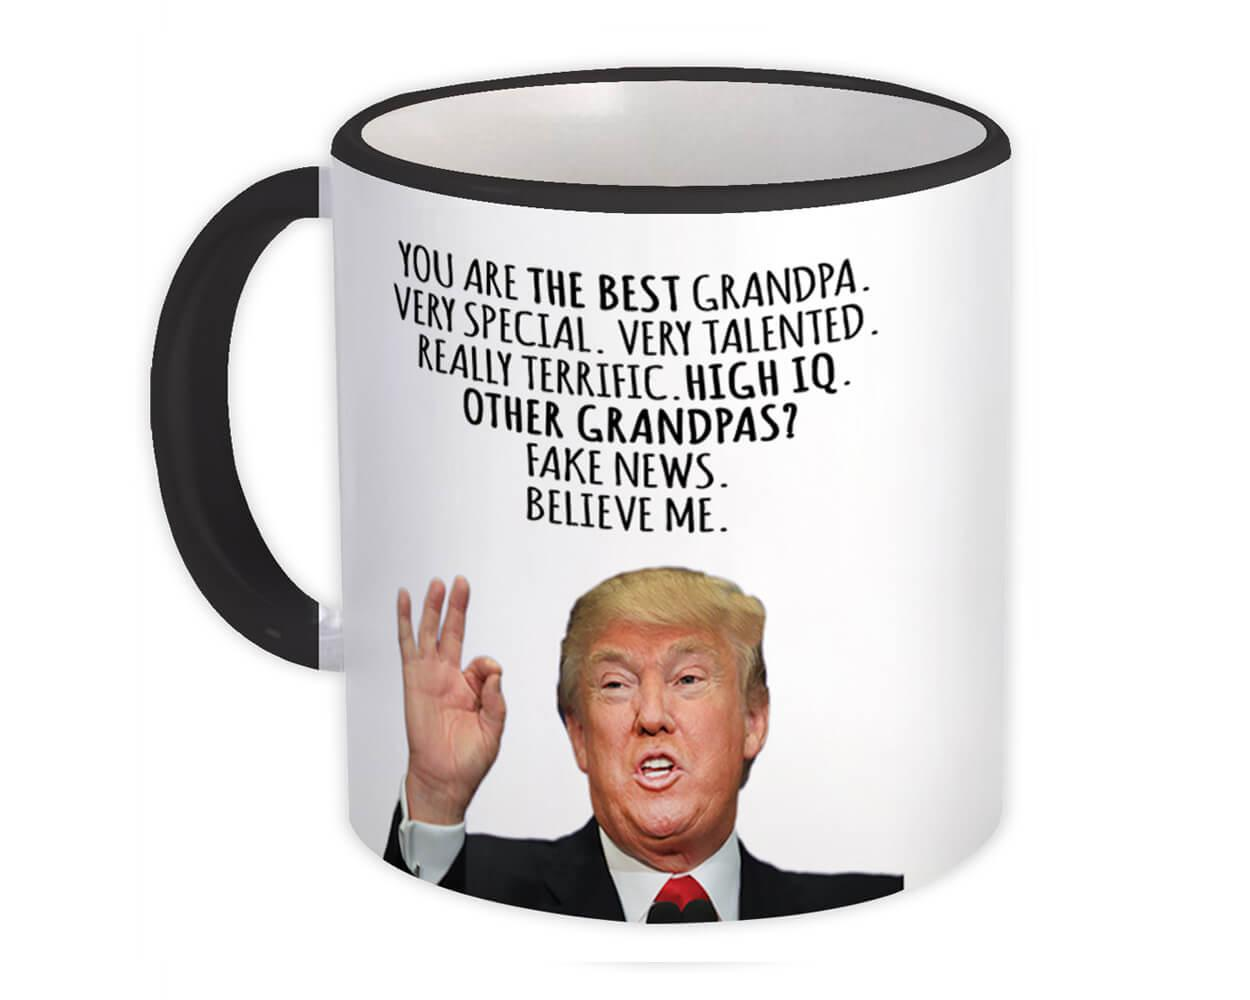 Gift for GRANDPA : Gift Mug Donald Trump The Best GRANPA Funny Fathers Day